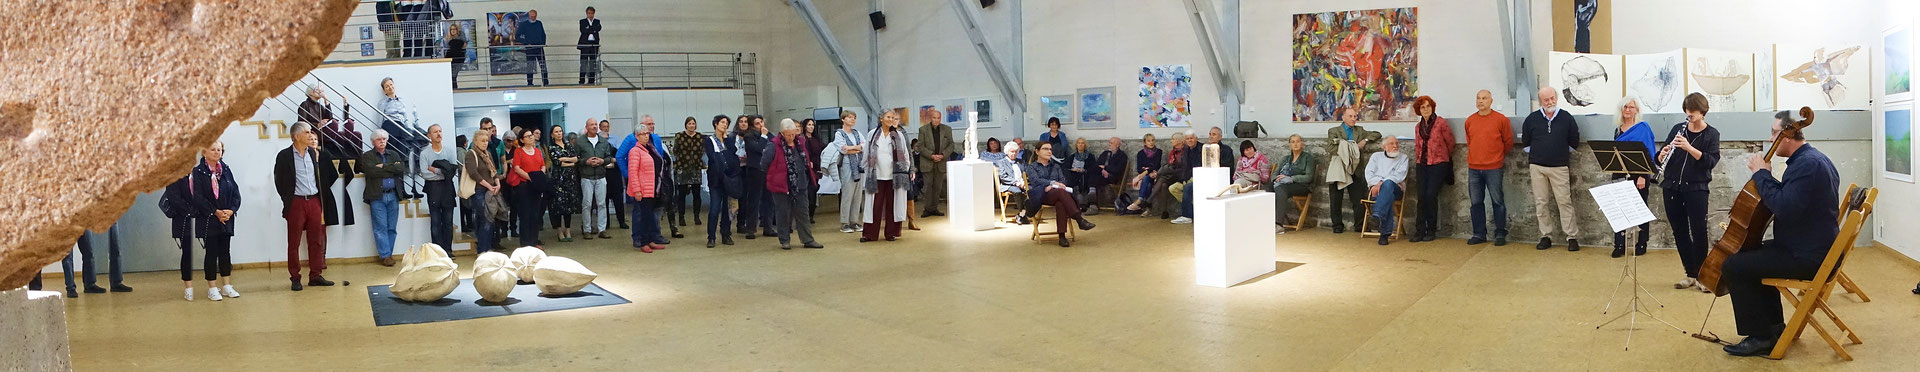 Hans Kumpf: Panorama der HKV Jahresausstellung